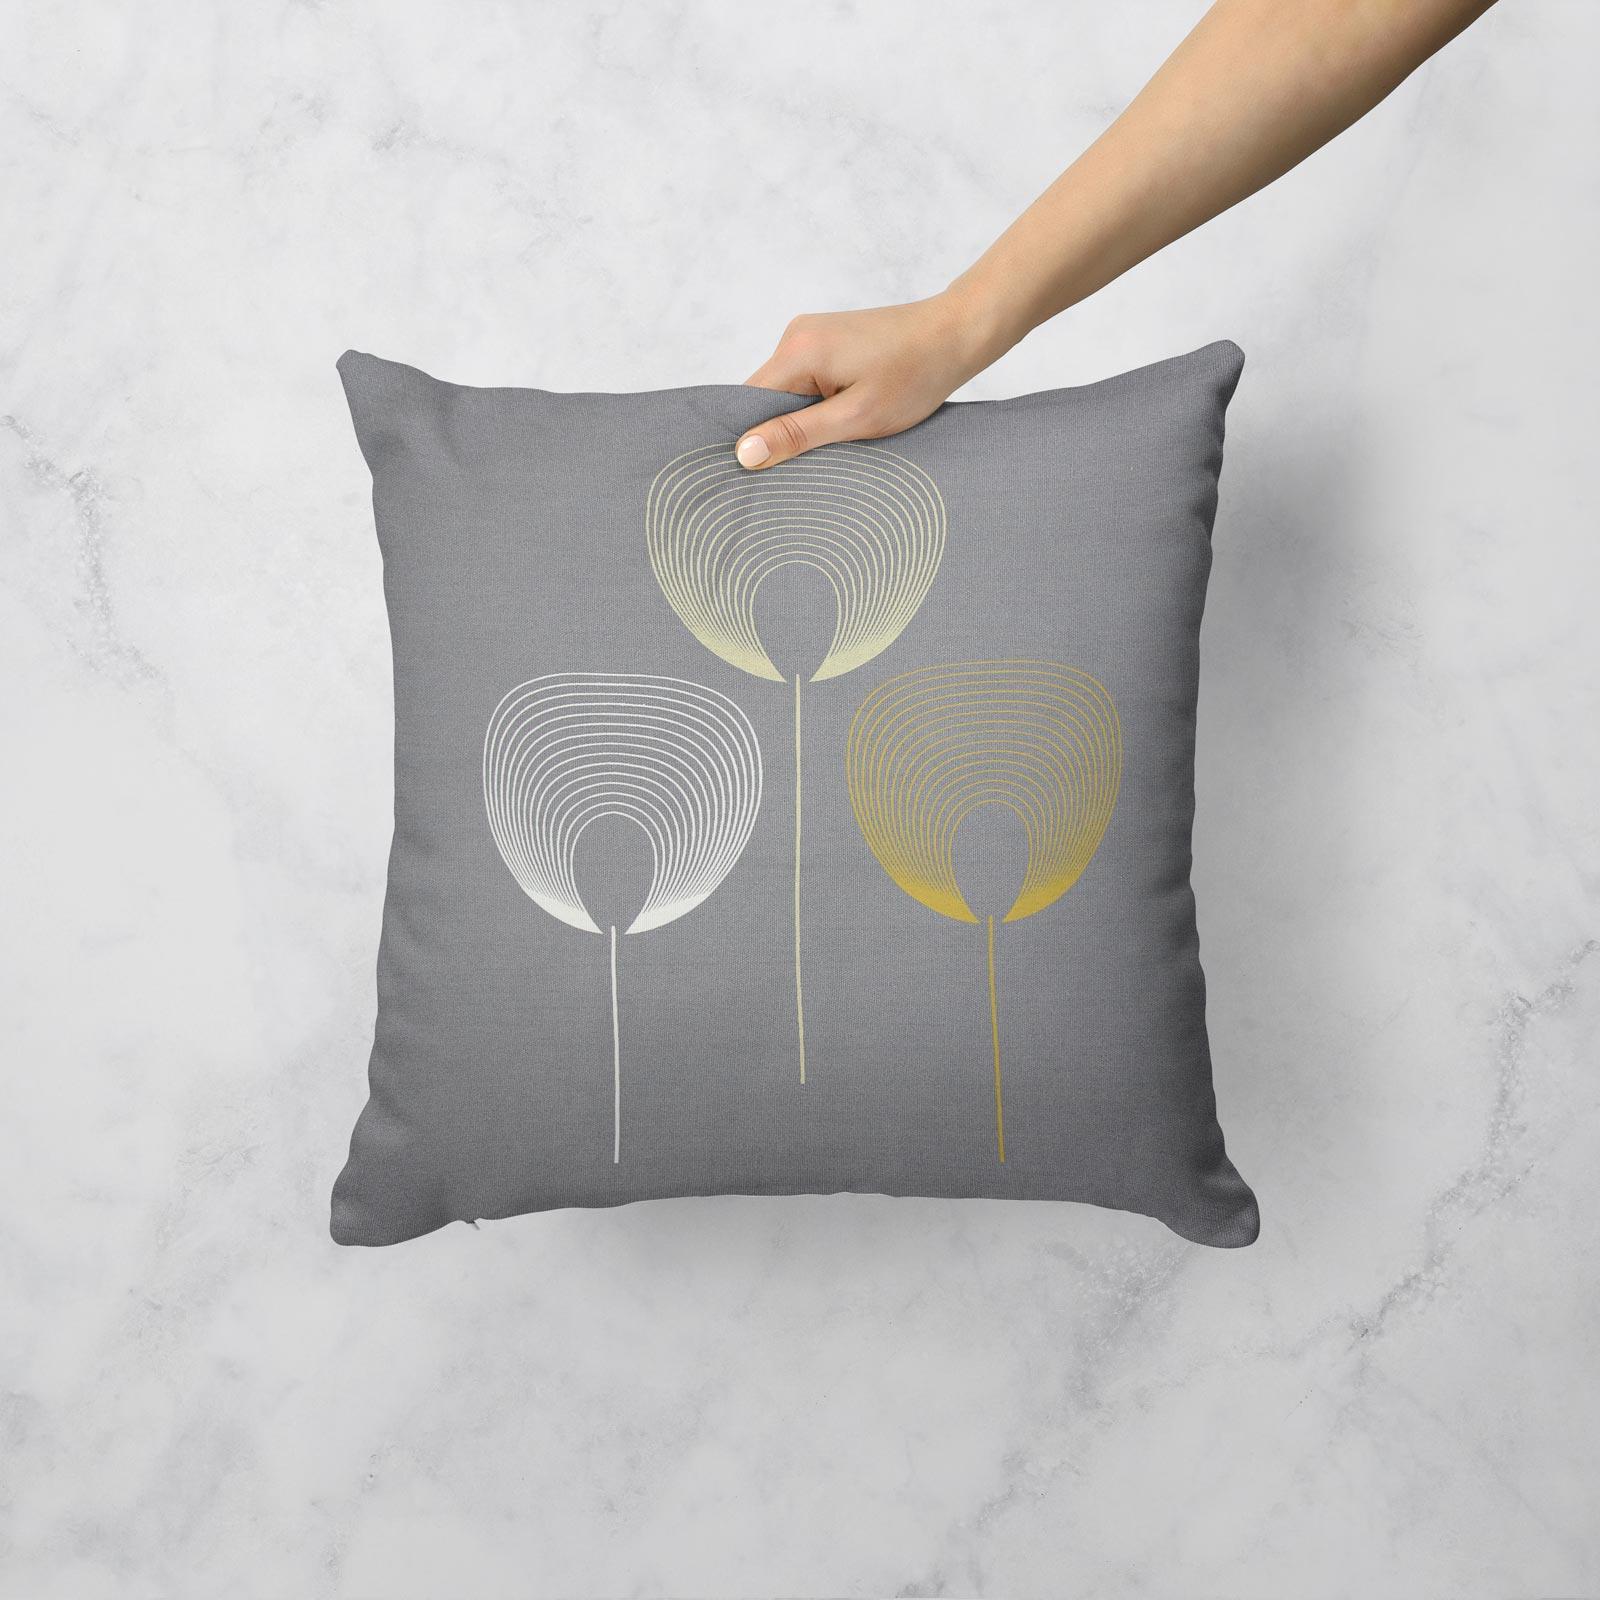 Geometrica-Cushion-Covers-Cojines-De-Impresion-Floral-Gris-Beige-Ocre-cubre-17-034-X-17-034 miniatura 18